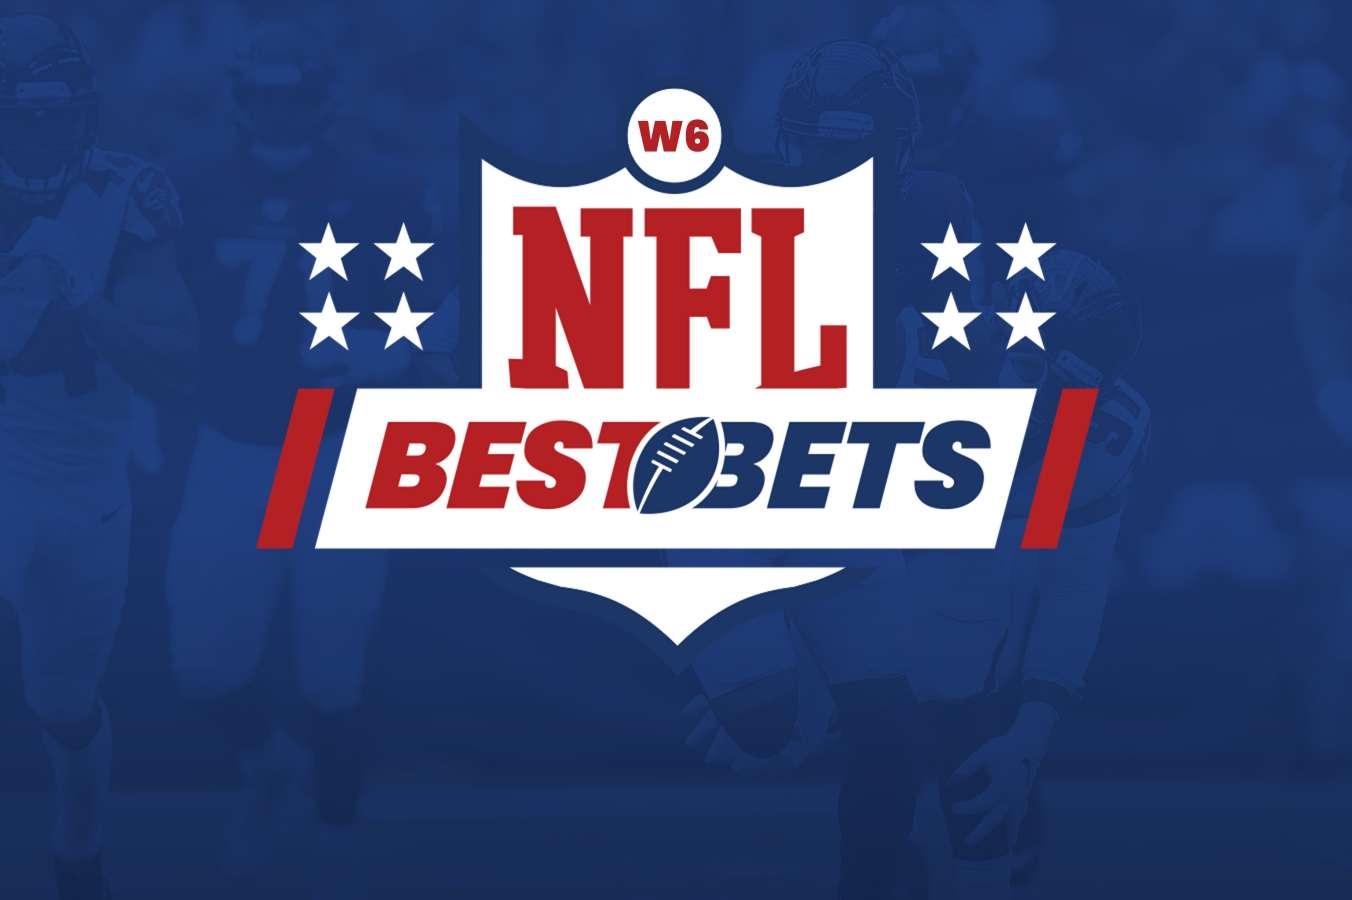 Nfl Week 6 Betting Tips Odds